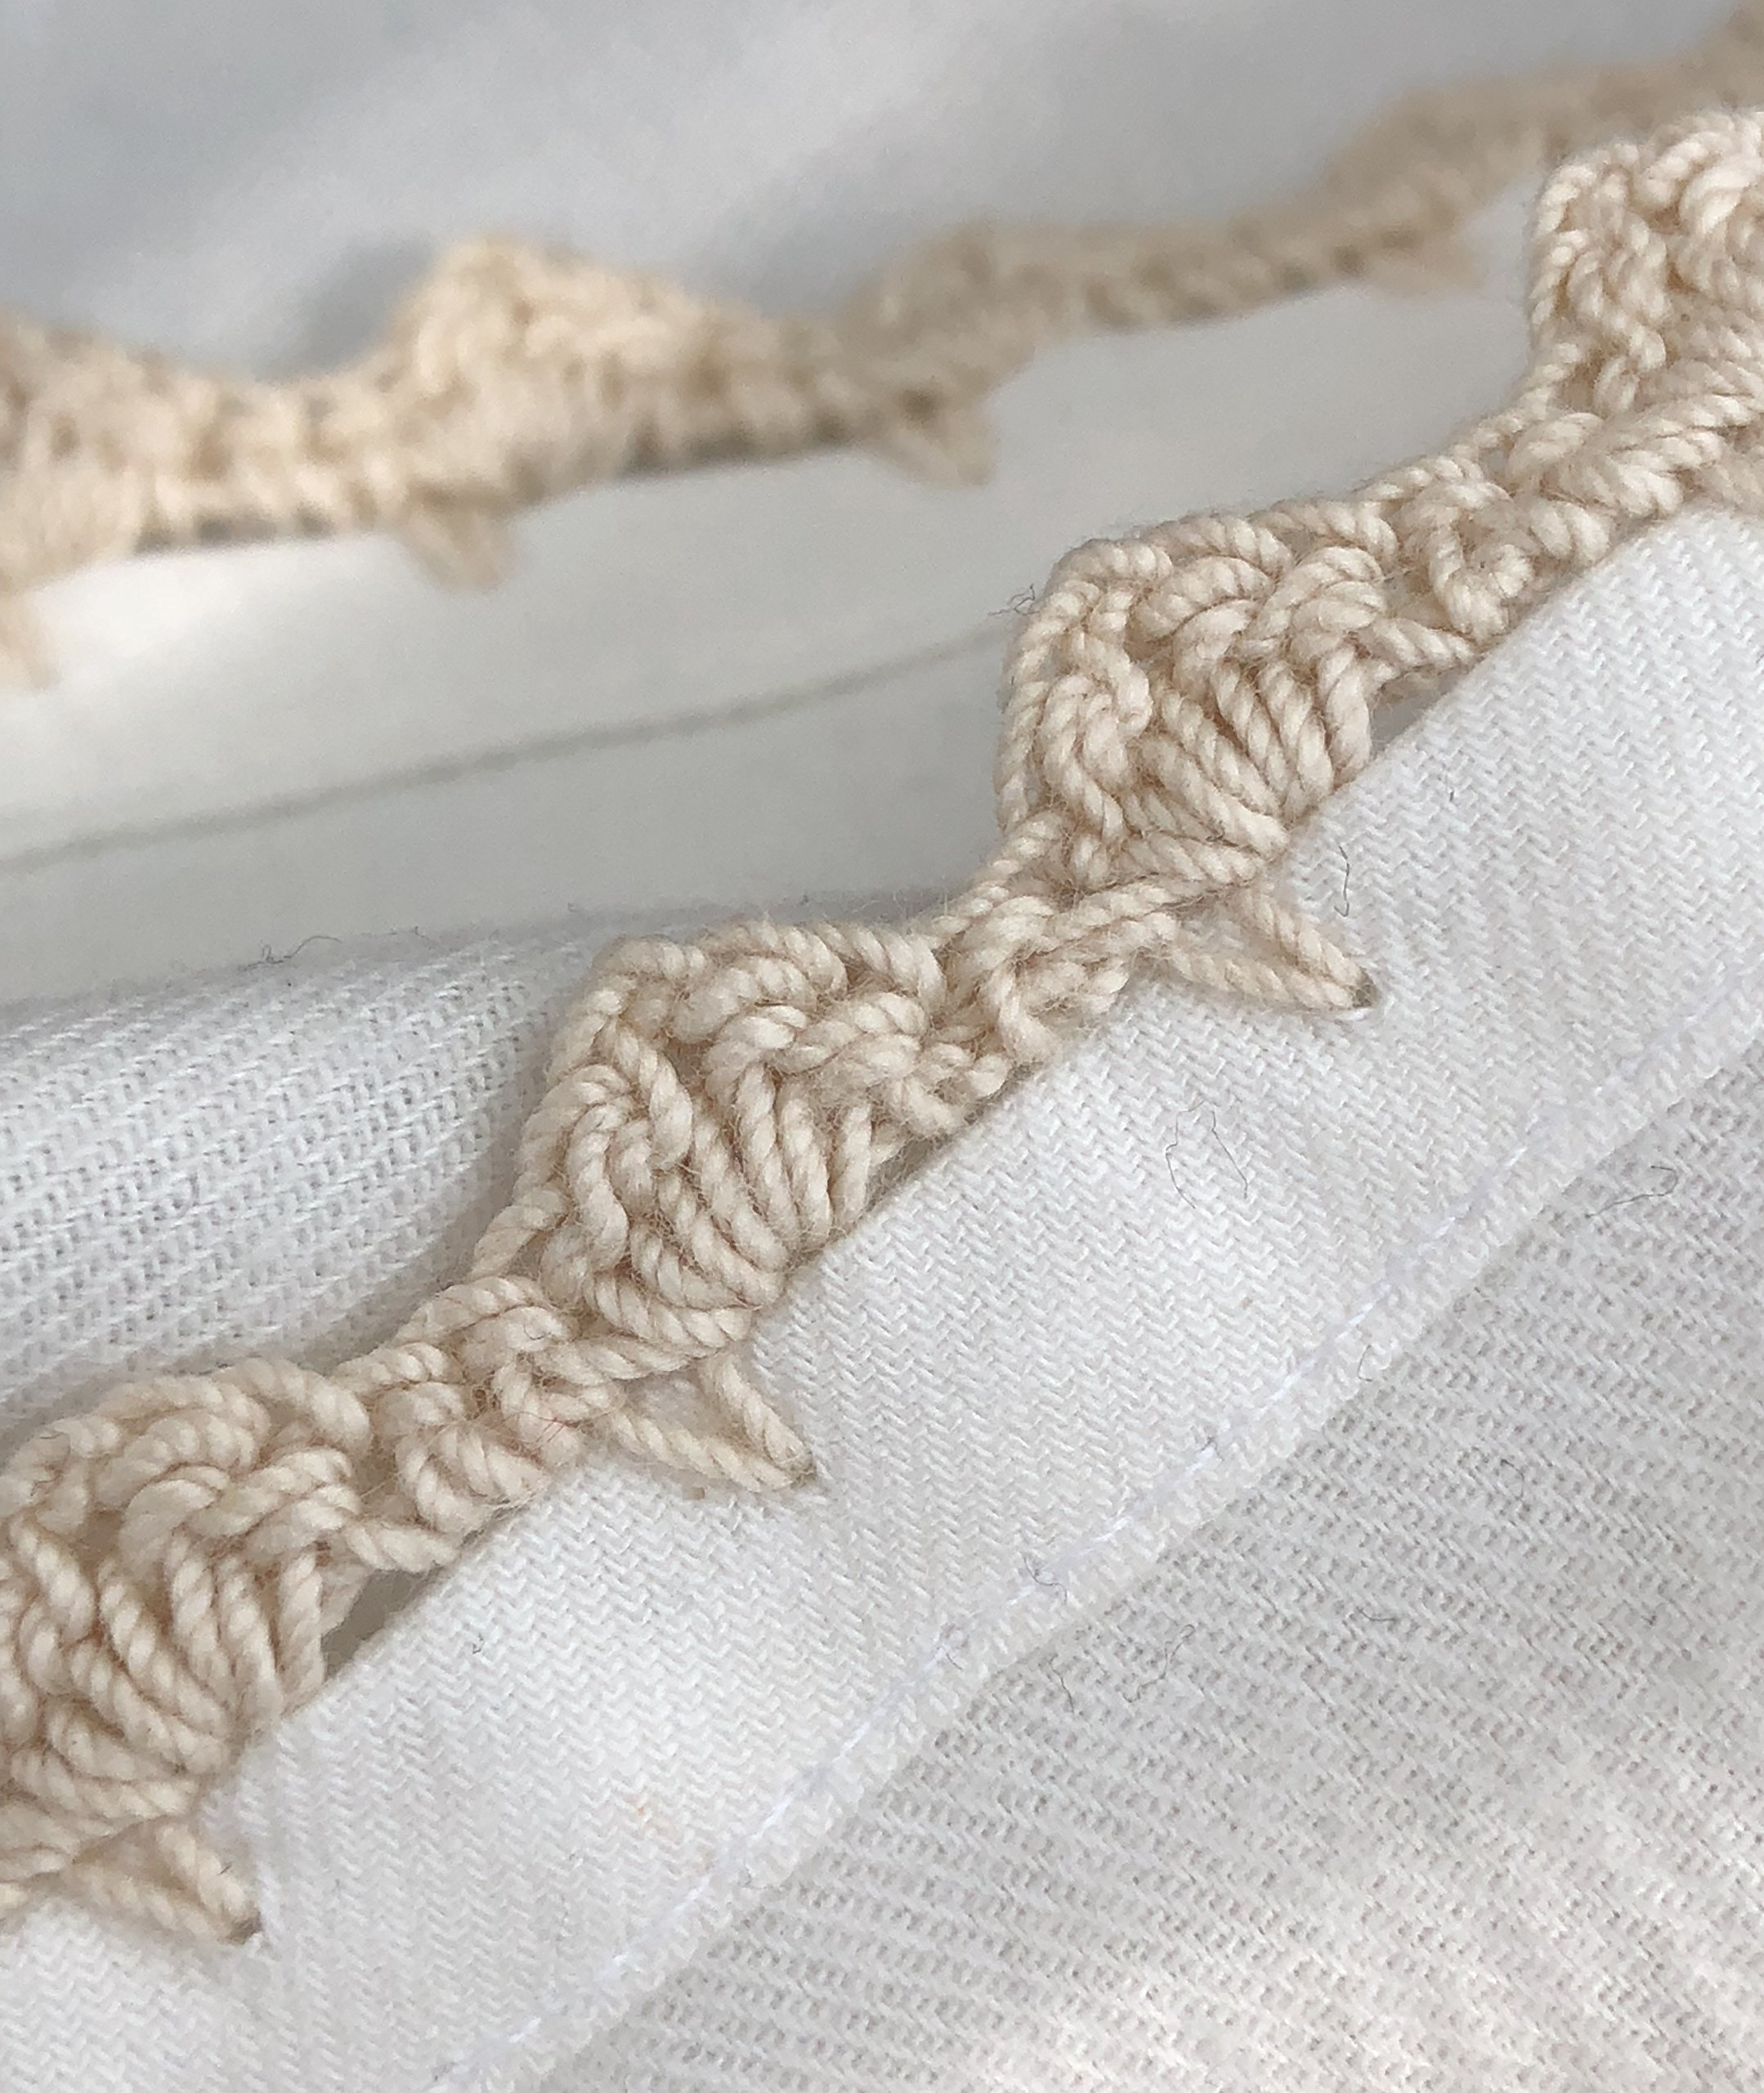 MoLi 100% Egyptian Cotton Cloth Dinner Napkins Hand Crocheted - Set of 6 Pack Lunch Linen - Elegant Decorative Fabric Handmade Table Linens - Servilletas de Tela Wedding Napkin (White) by MoLi (Image #5)